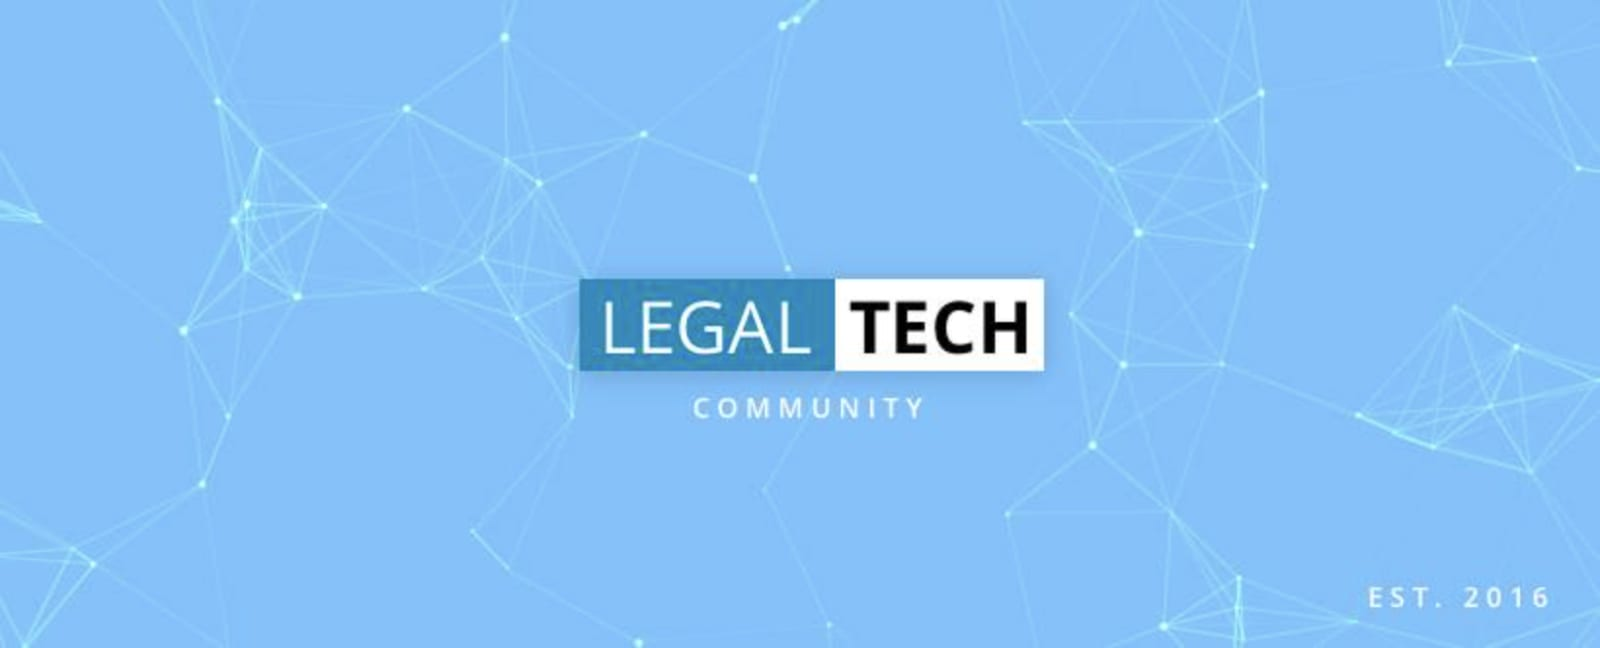 legaltech community facebook group